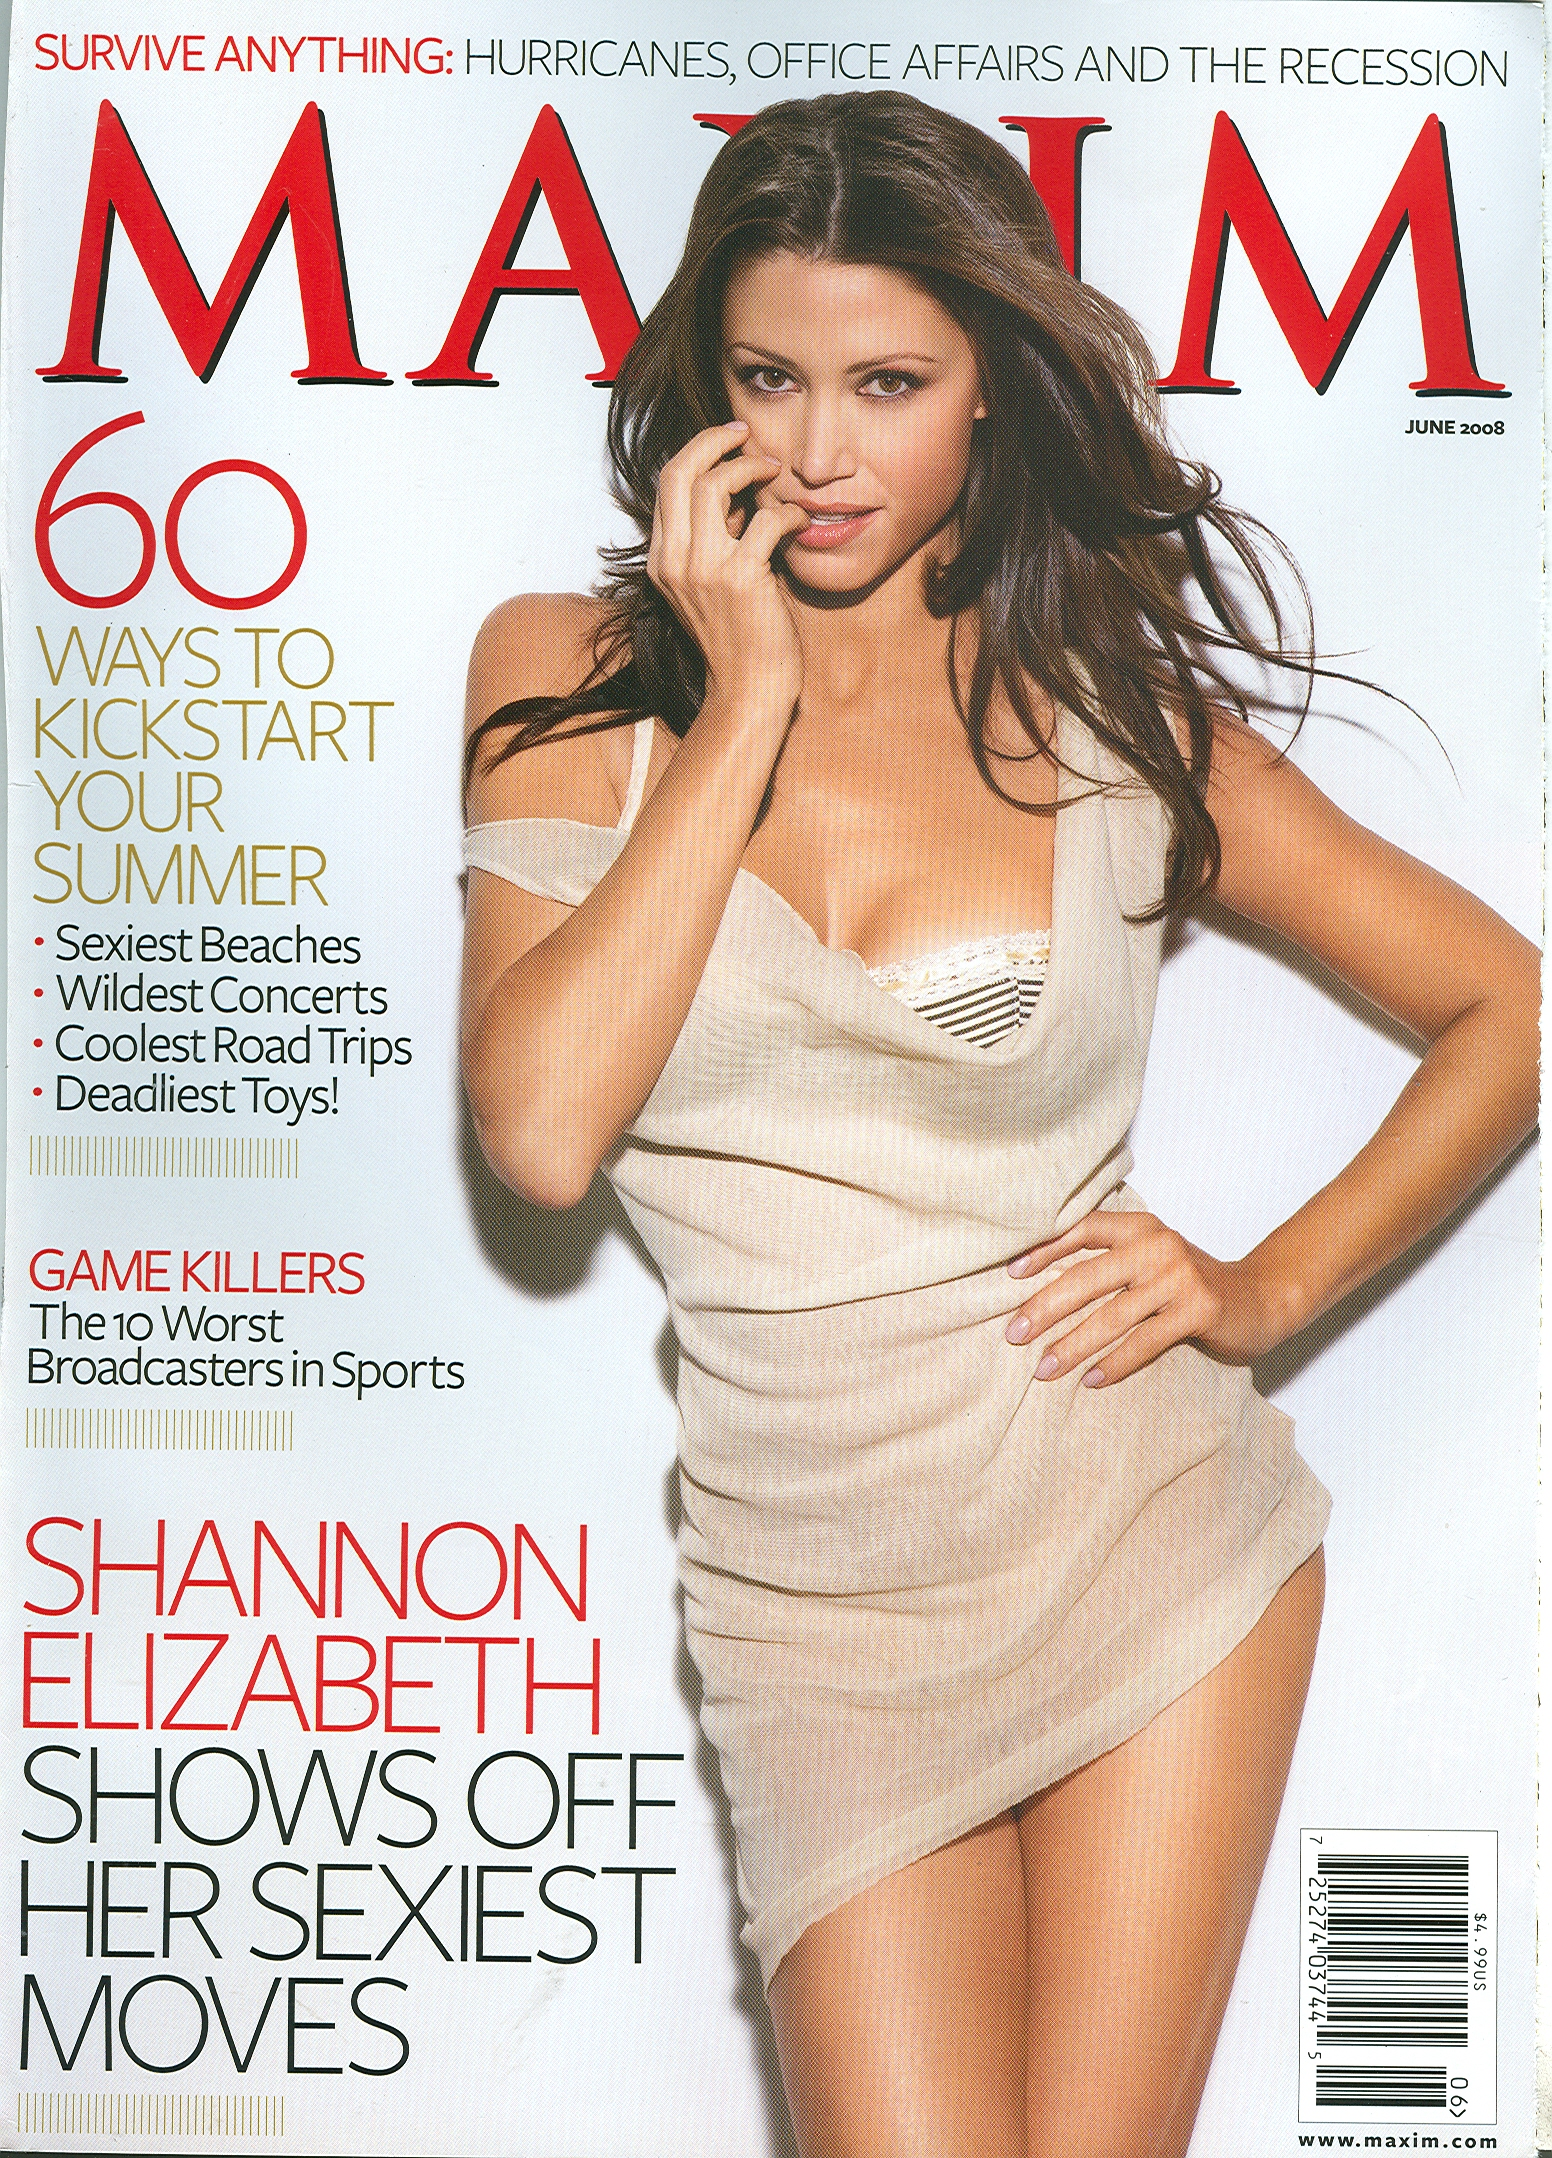 SE_Maxim Magazine_June 2008_1.jpg